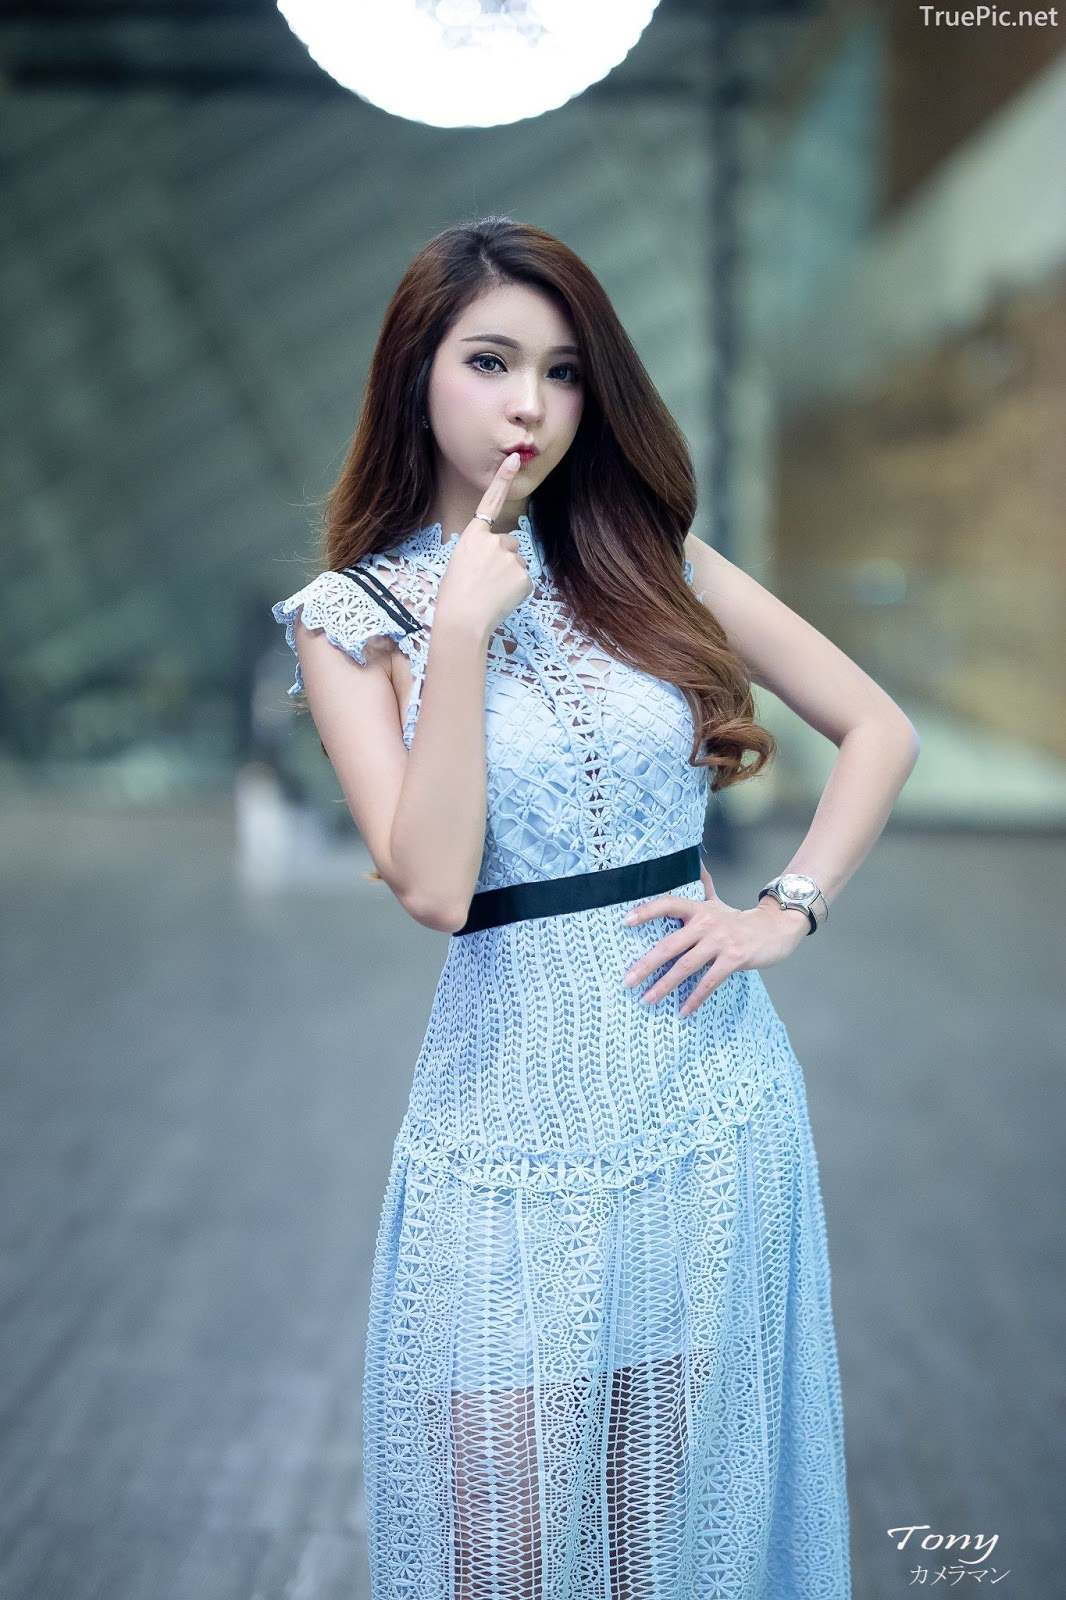 Thailand hot model – Janet Kanokwan Saesim – Sexy vs Cute and Bra vs Long Dress - Picture 4